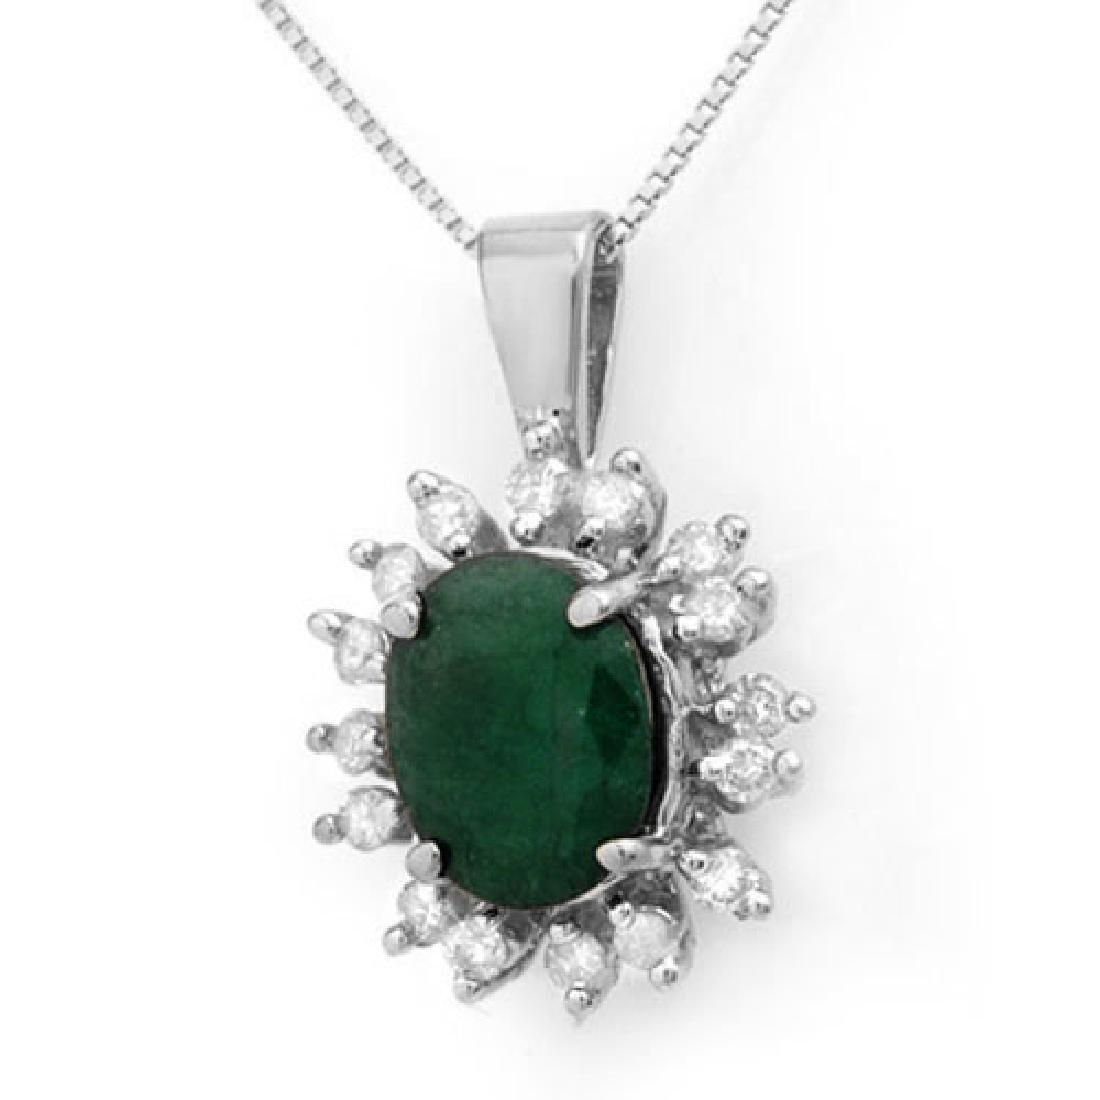 4.20 CTW Emerald & Diamond Pendant 14K White Gold